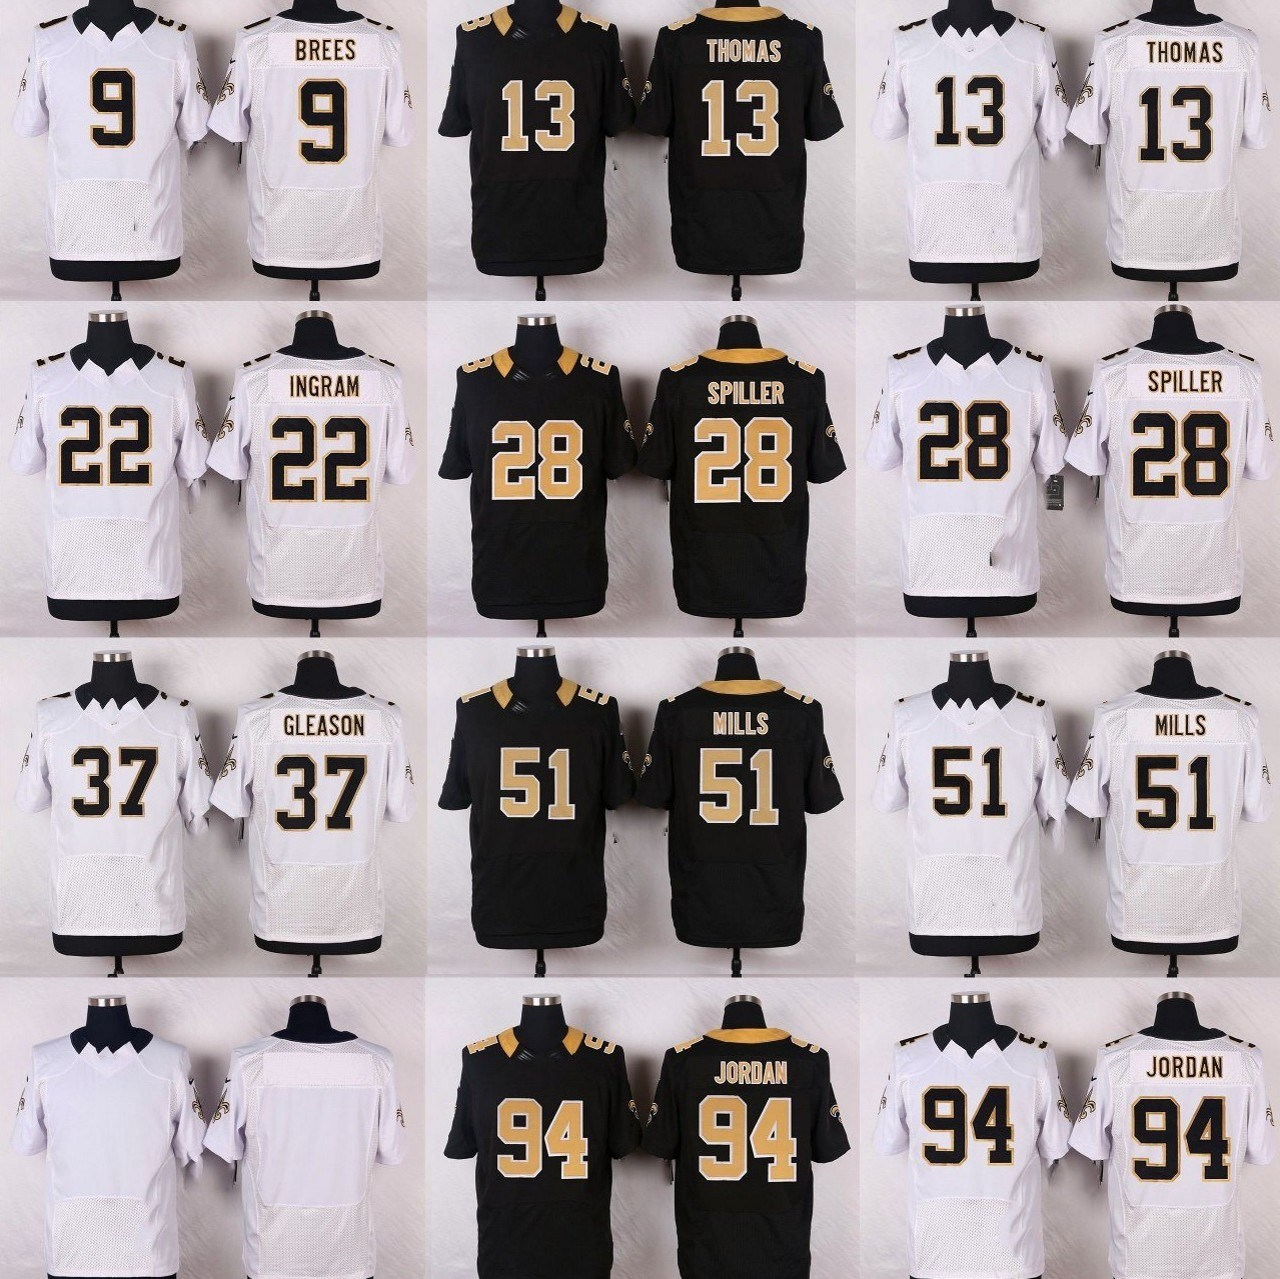 sale retailer 8b2b9 fc9d0 [Hot Item] Drew Brees Michael Thomas Alvin Kamara New Orleans Football  Jerseys